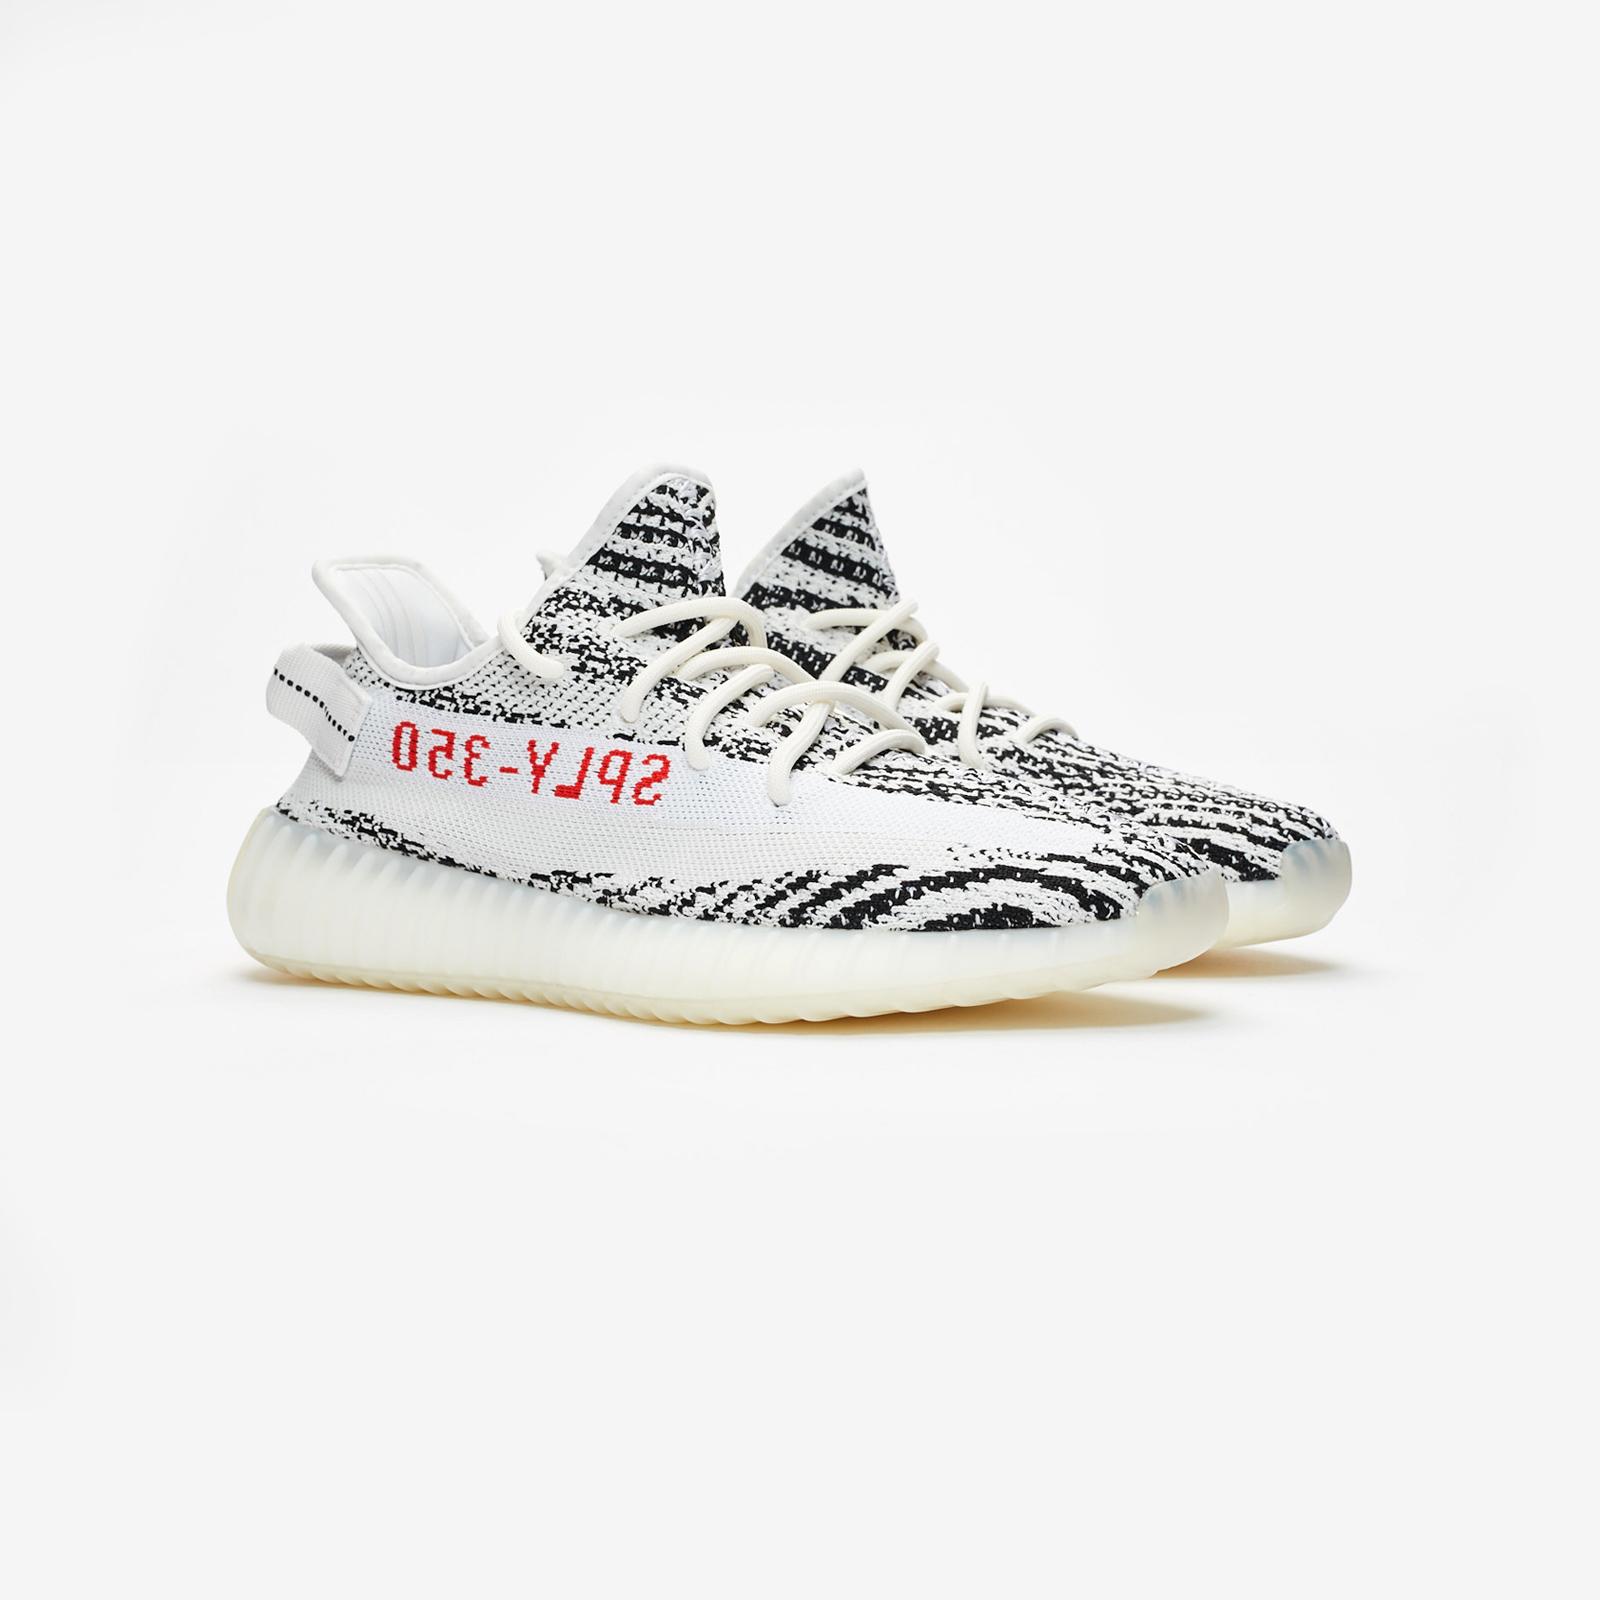 adidas Yeezy Boost 350 V2 - Cp9654